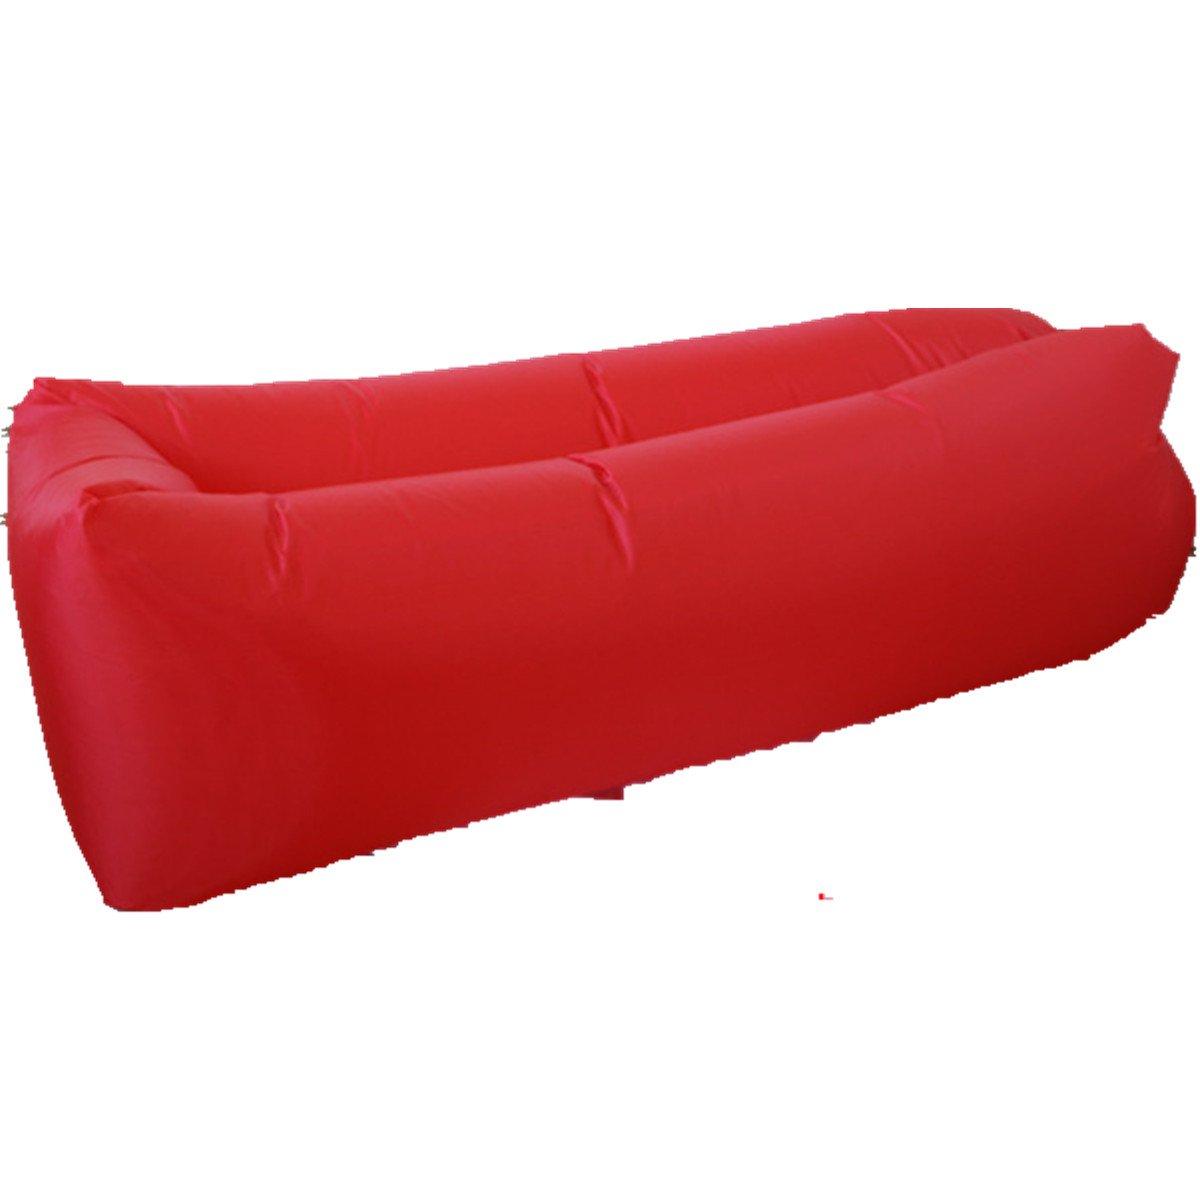 VADOO ビーチシートバッグ 膨張式エアーソファーシートバッグ 至福の空気式寝袋 アウトドア B071F7CVFN  レッド